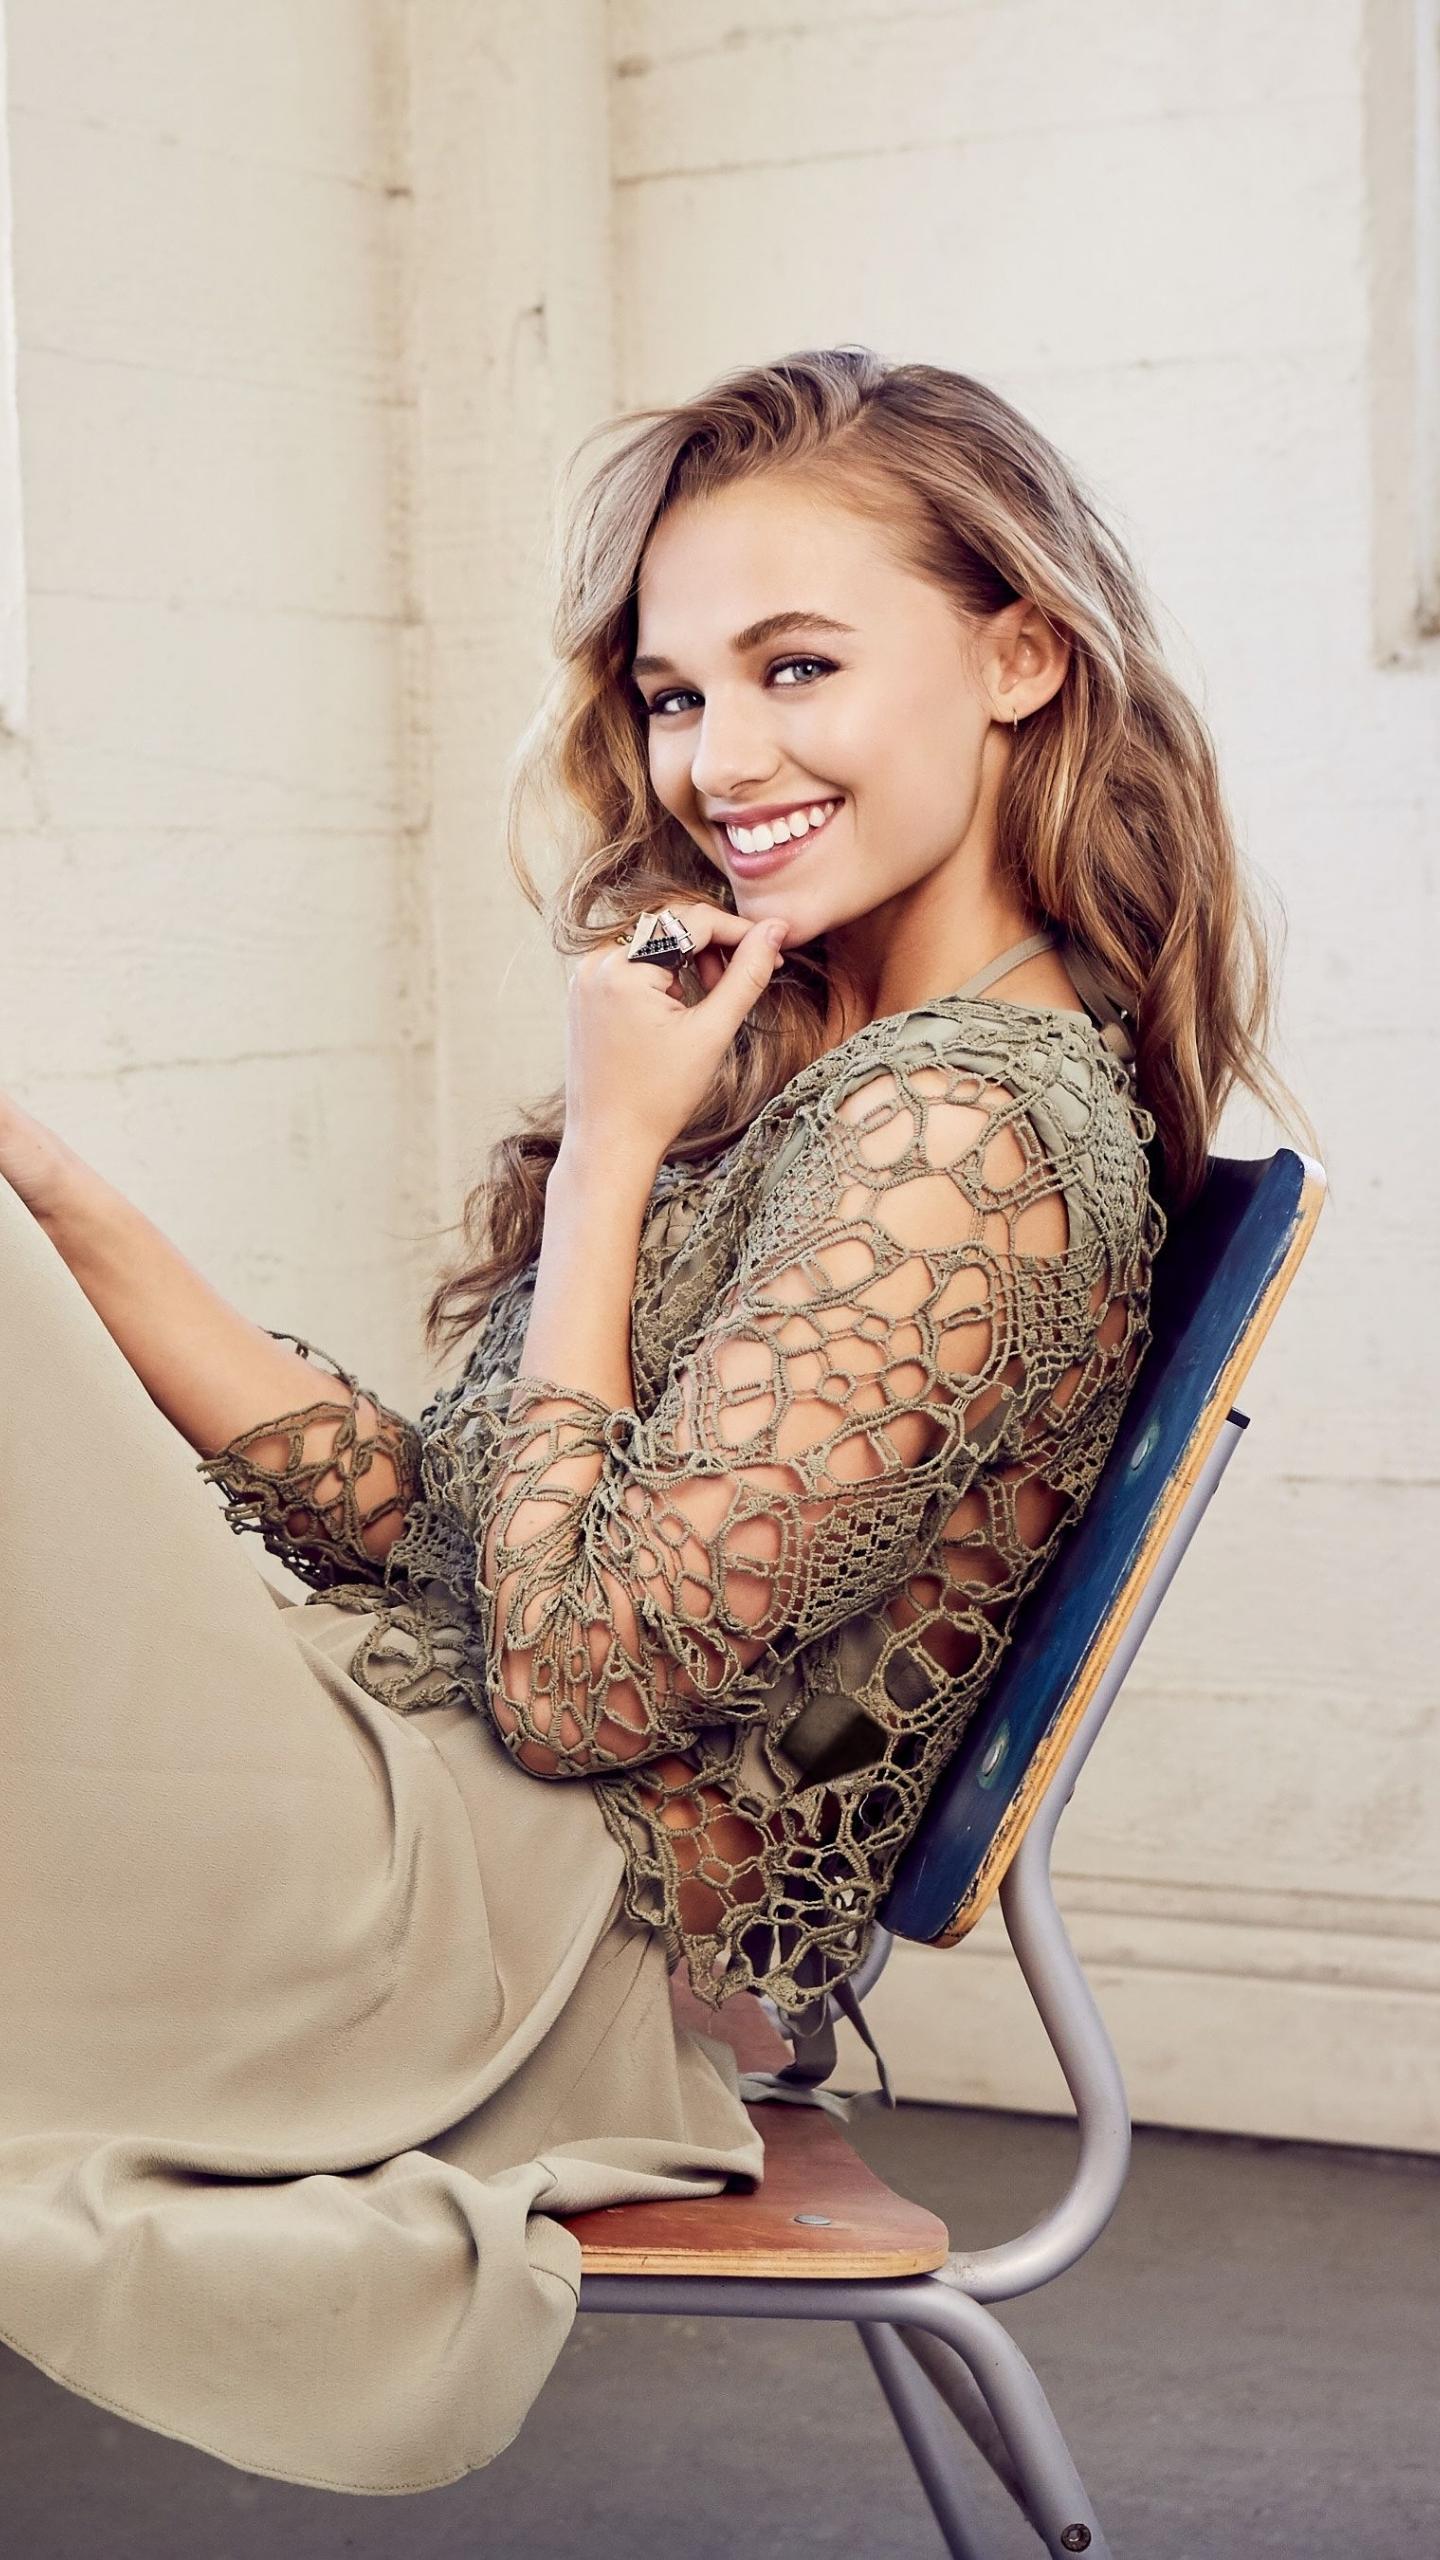 Madison Iseman, actress, smile, 2019, 1440x2560 wallpaper